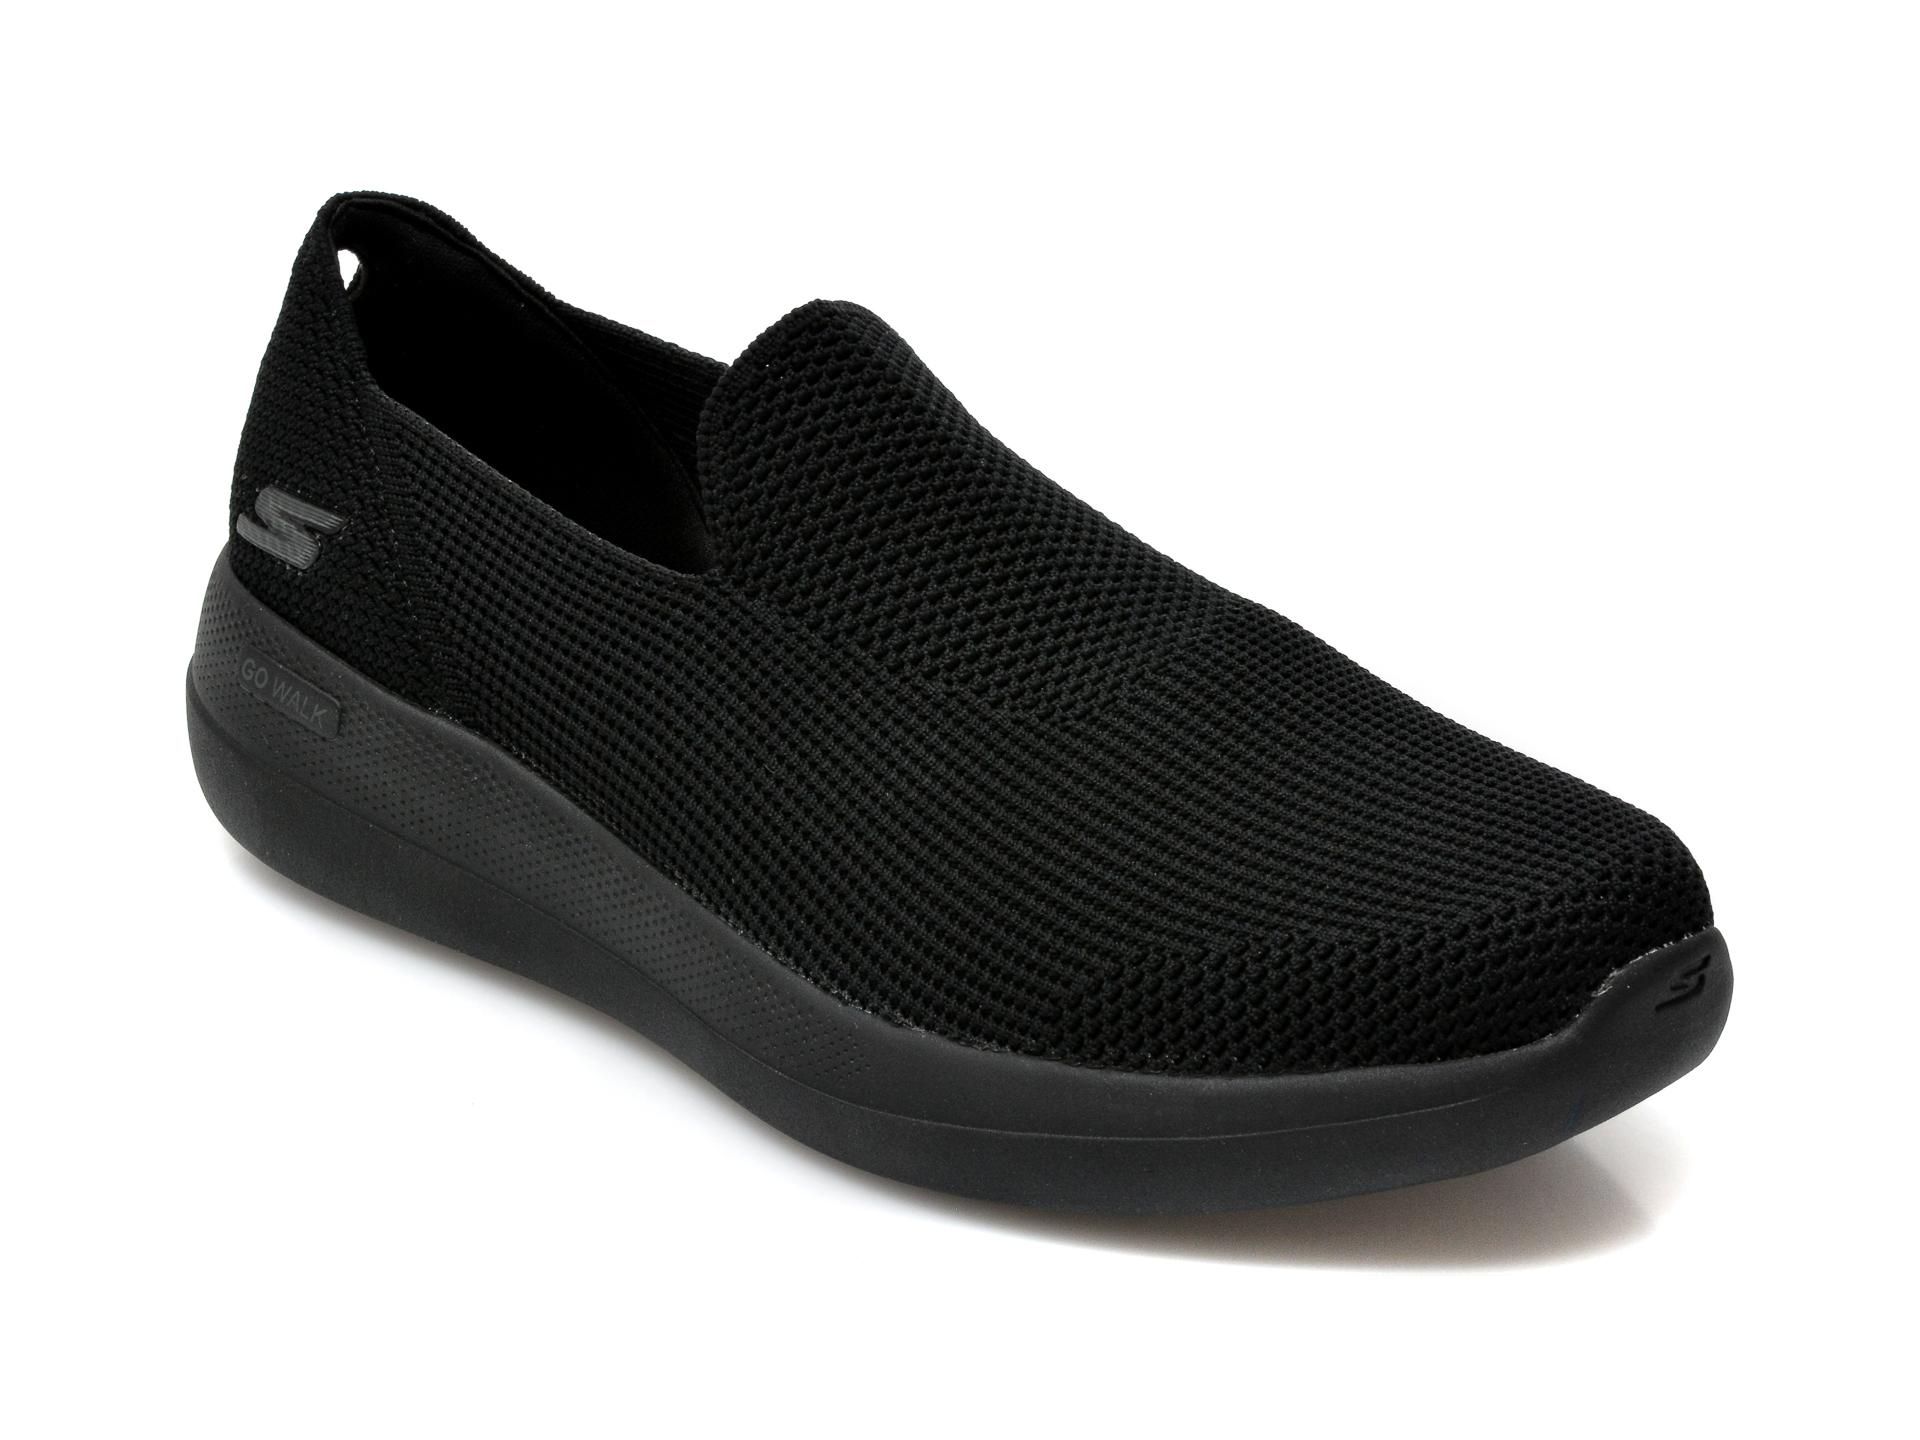 Pantofi sport SKECHERS negri, Go Walk Max Deluxe, din material textil imagine 2021 otter.ro